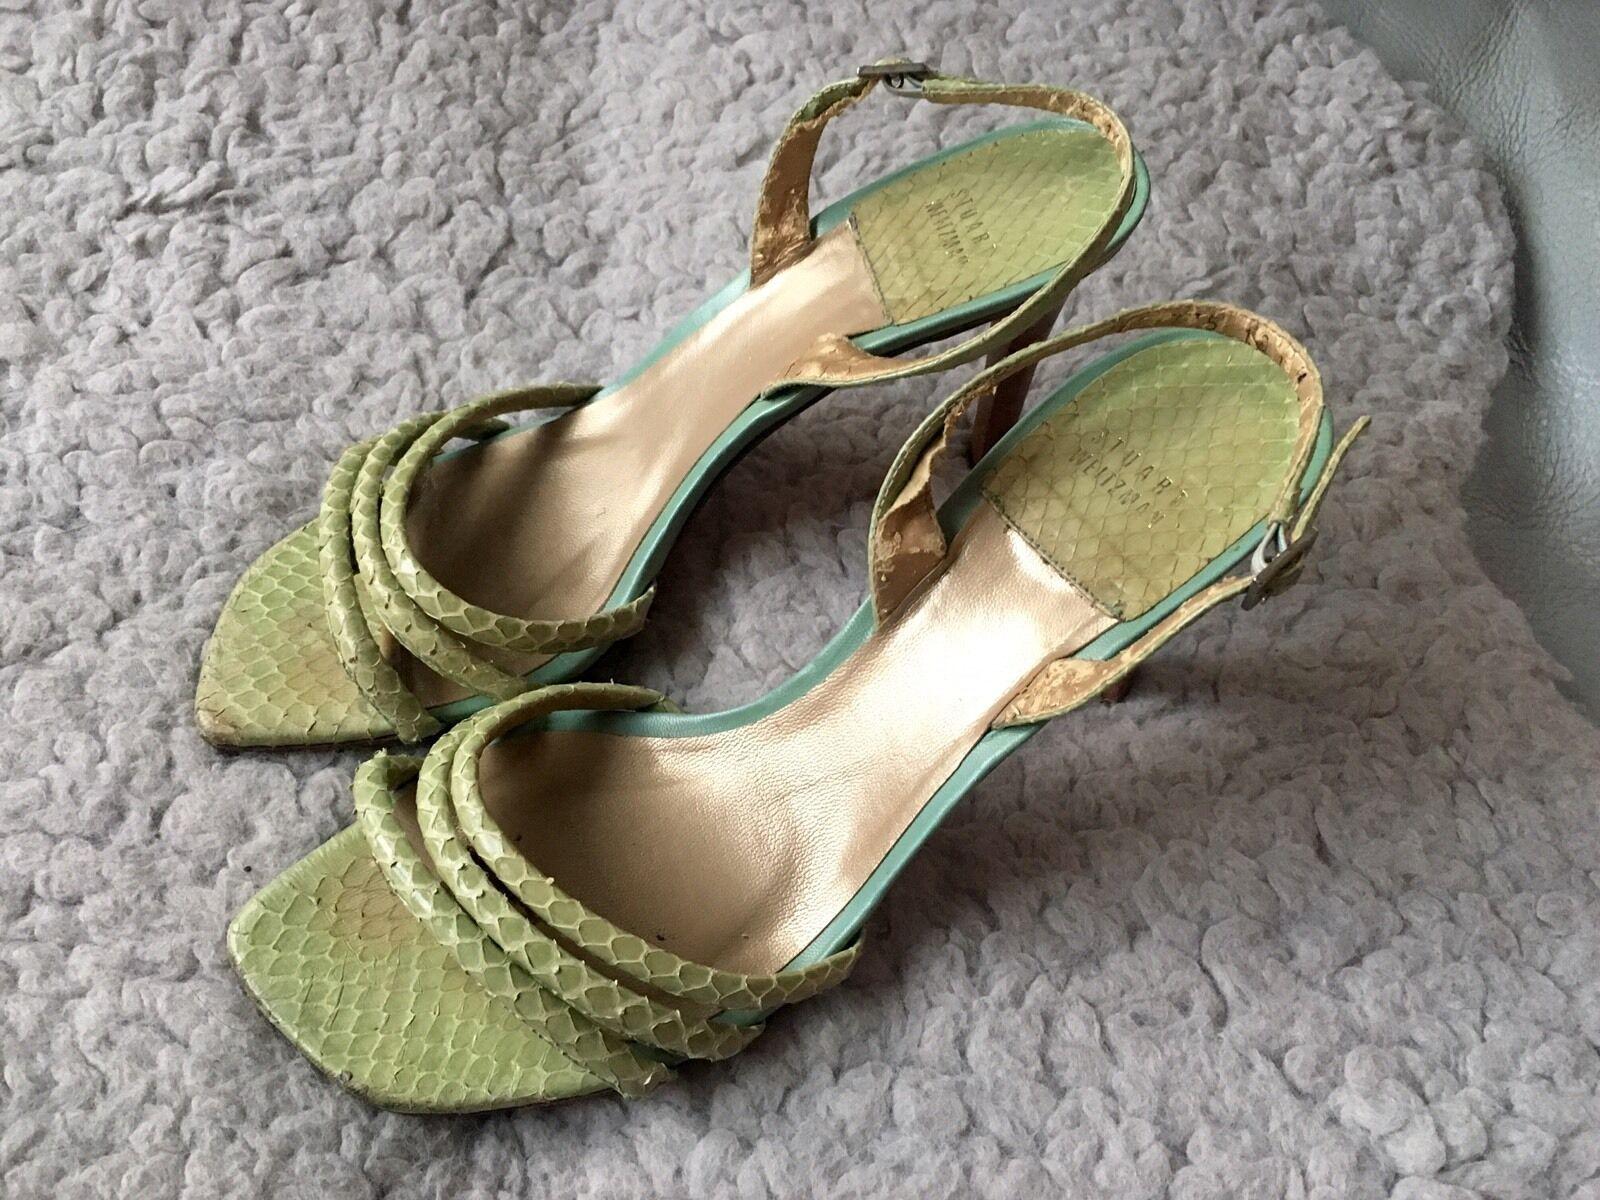 Stuart Weitzman Mint Grün Snakeskin and Leather Strappy Strappy Strappy Sandals, Größe 9.5 a8a19d